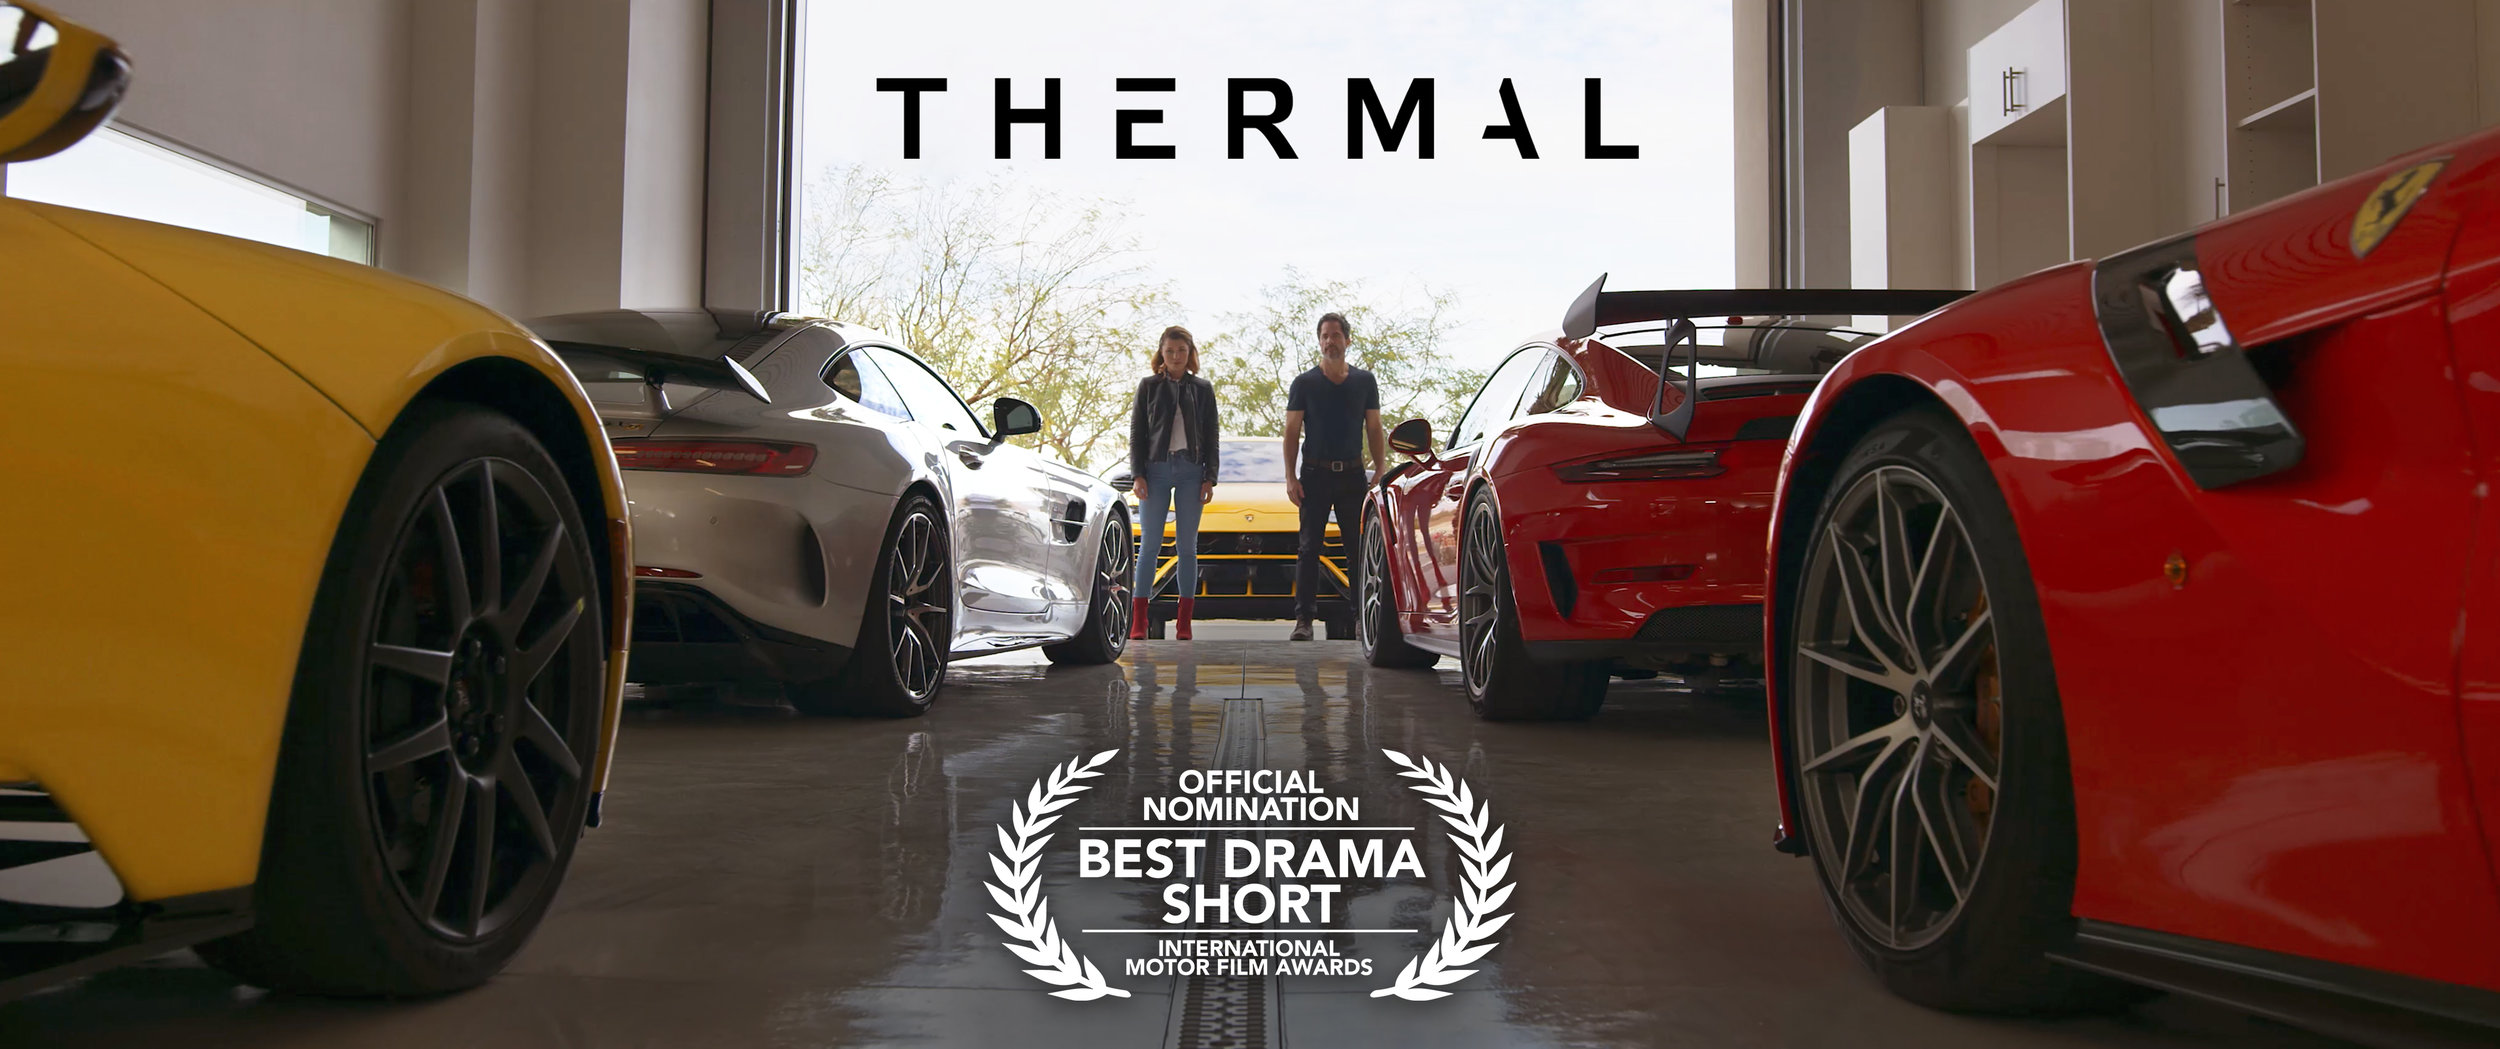 AJ Bleyer: Thermal (short film)